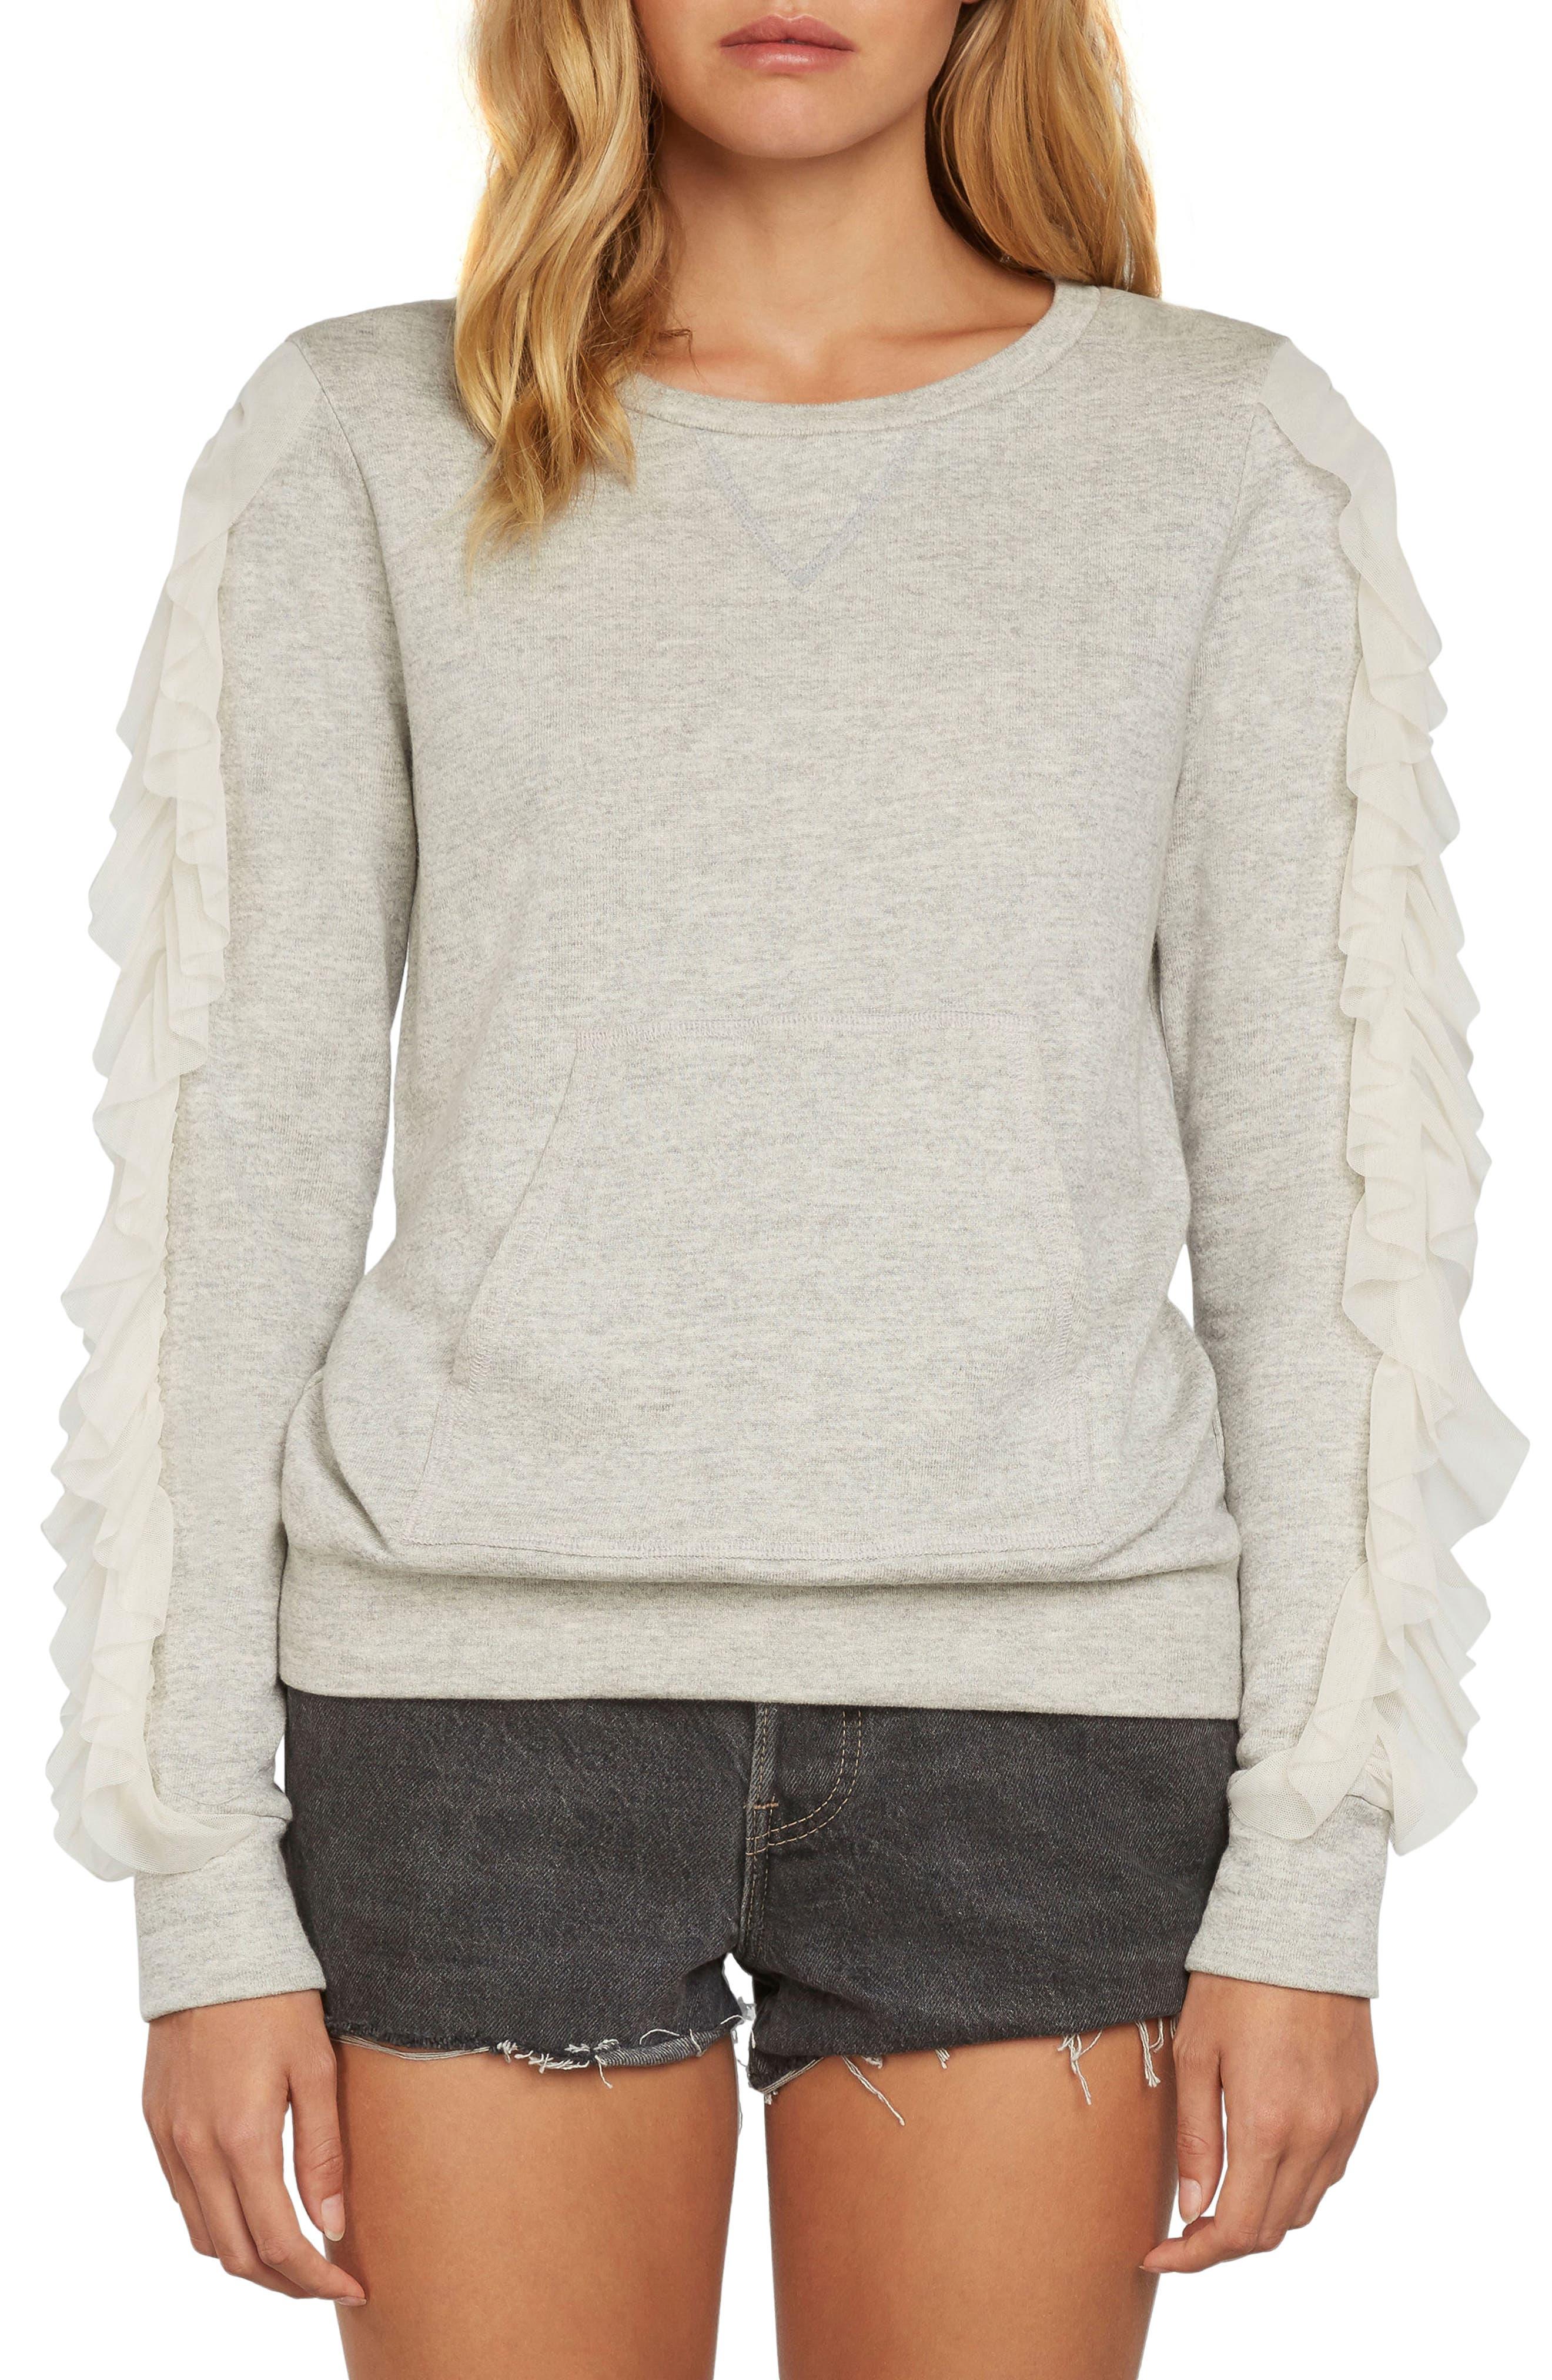 Ruffle Pullover Knit Sweatshirt,                         Main,                         color, Heather Grey